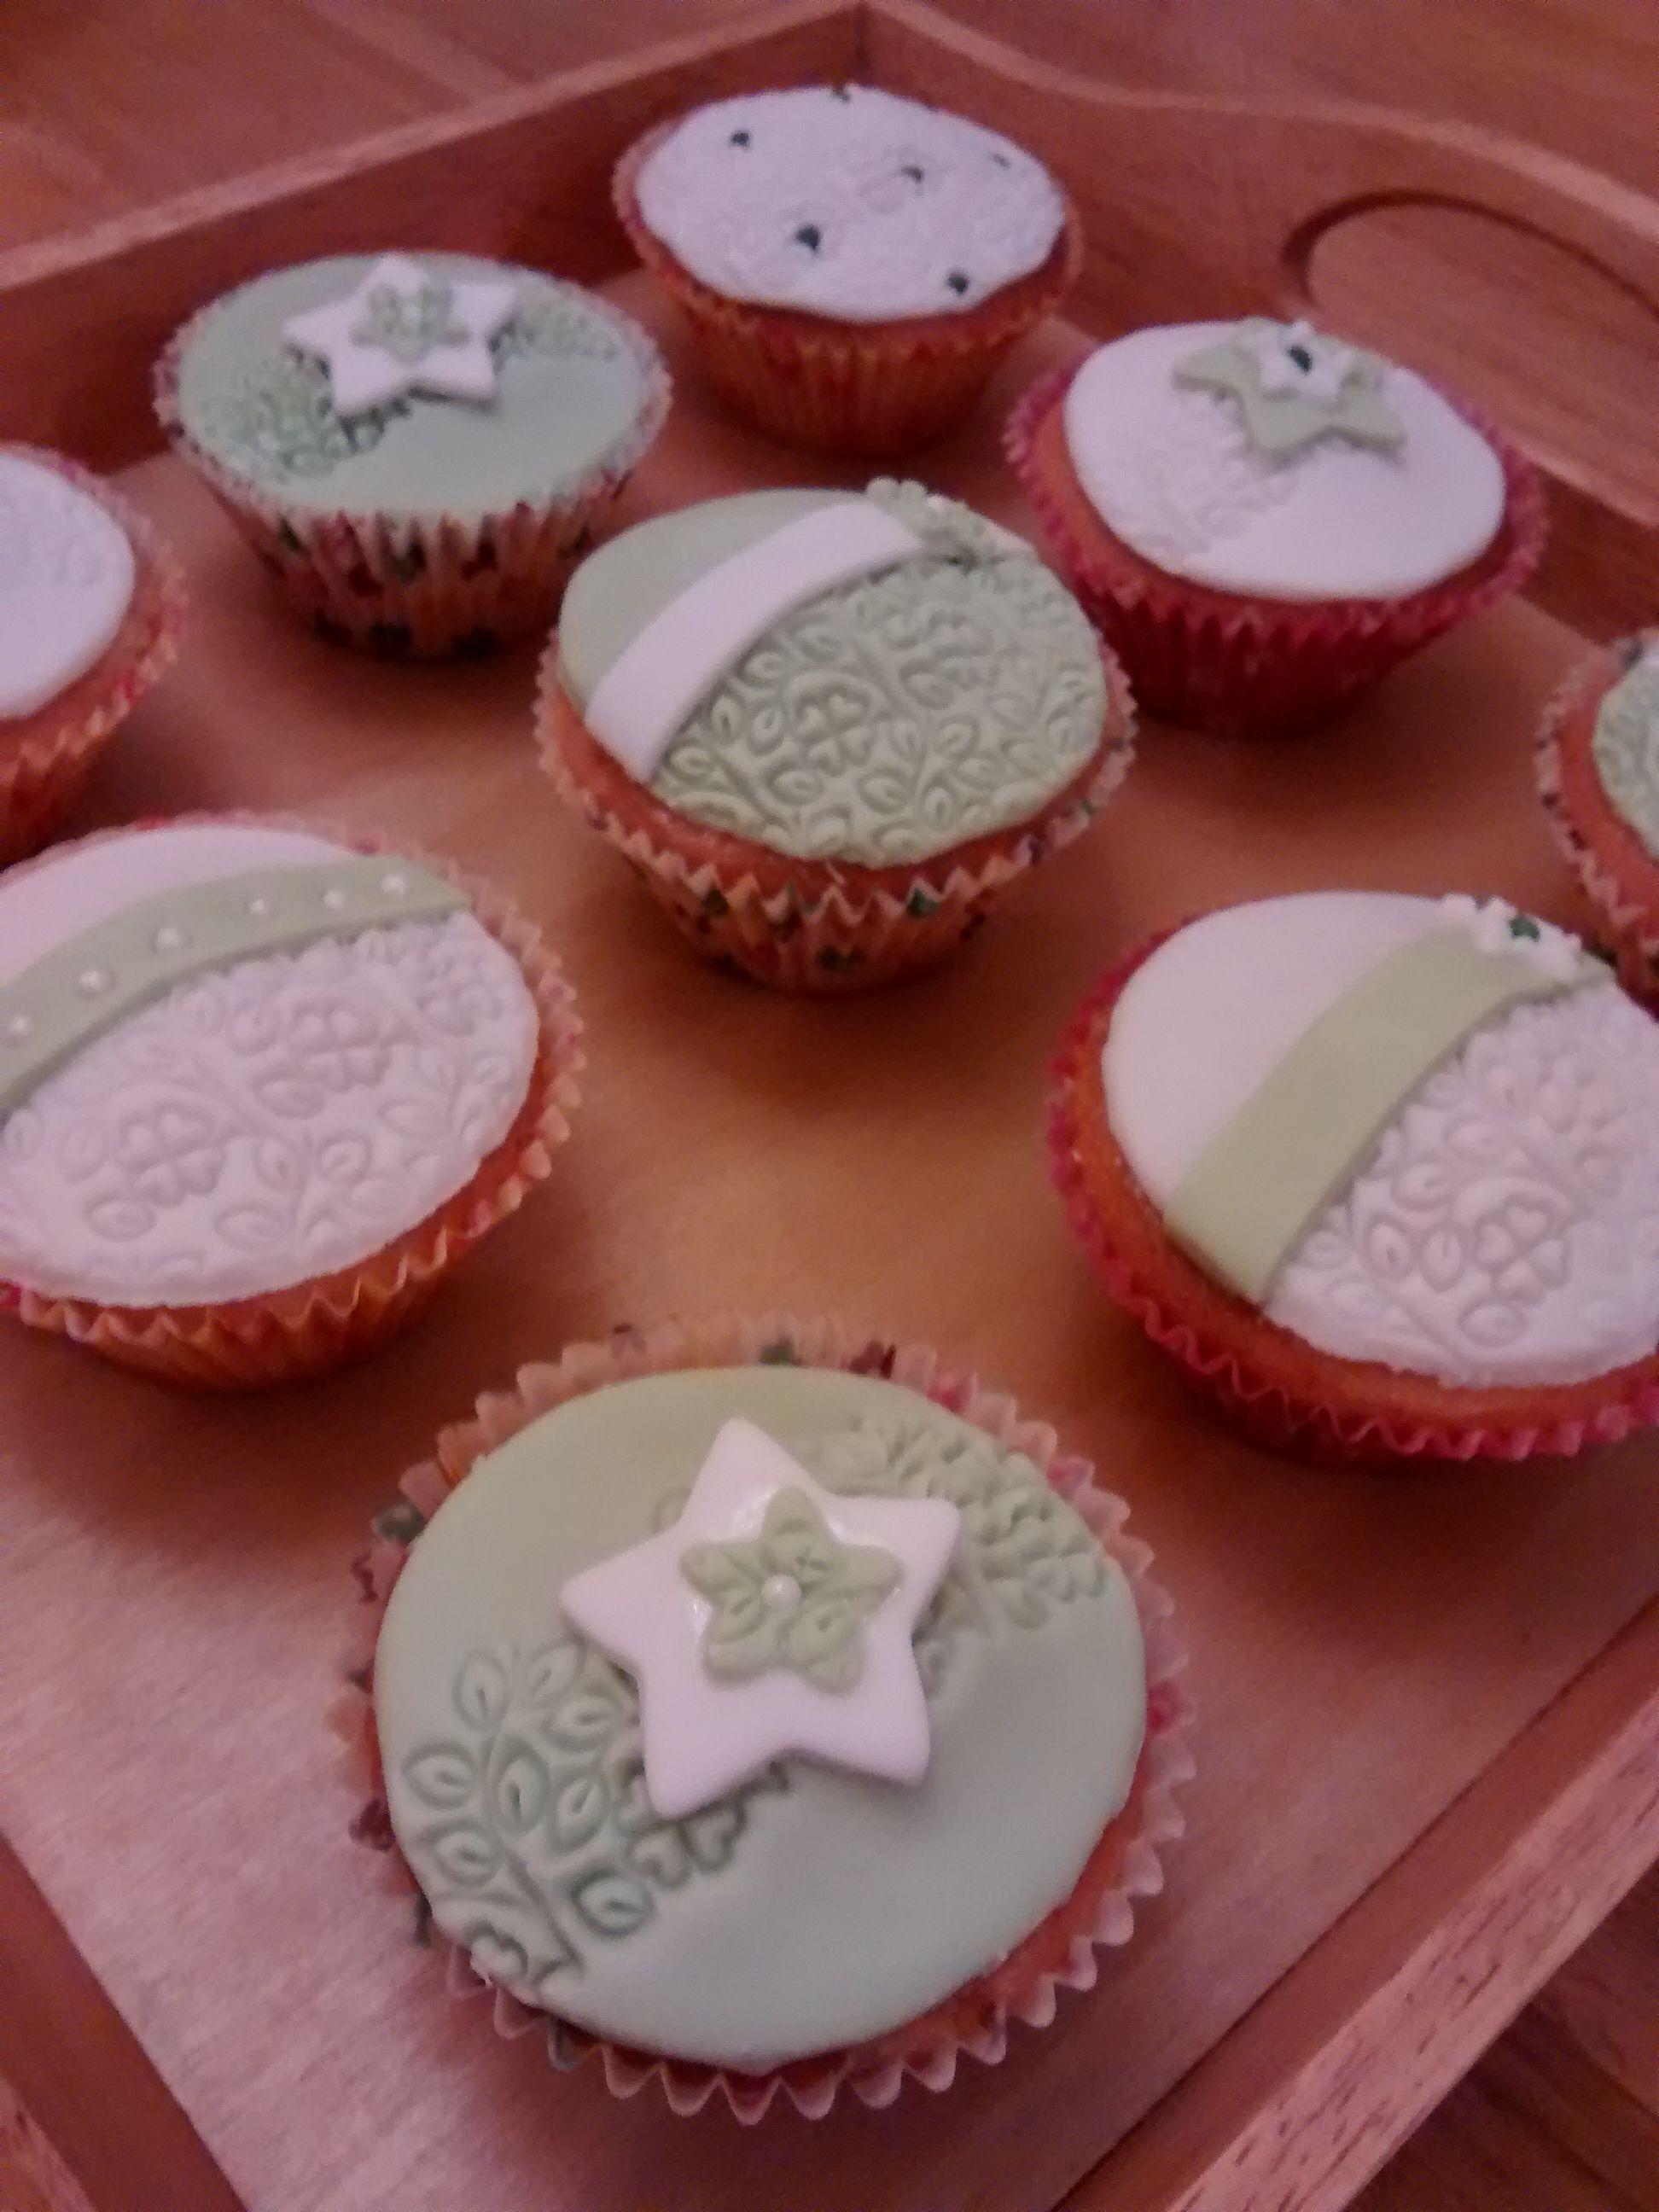 Macmillan fundraiser cakes